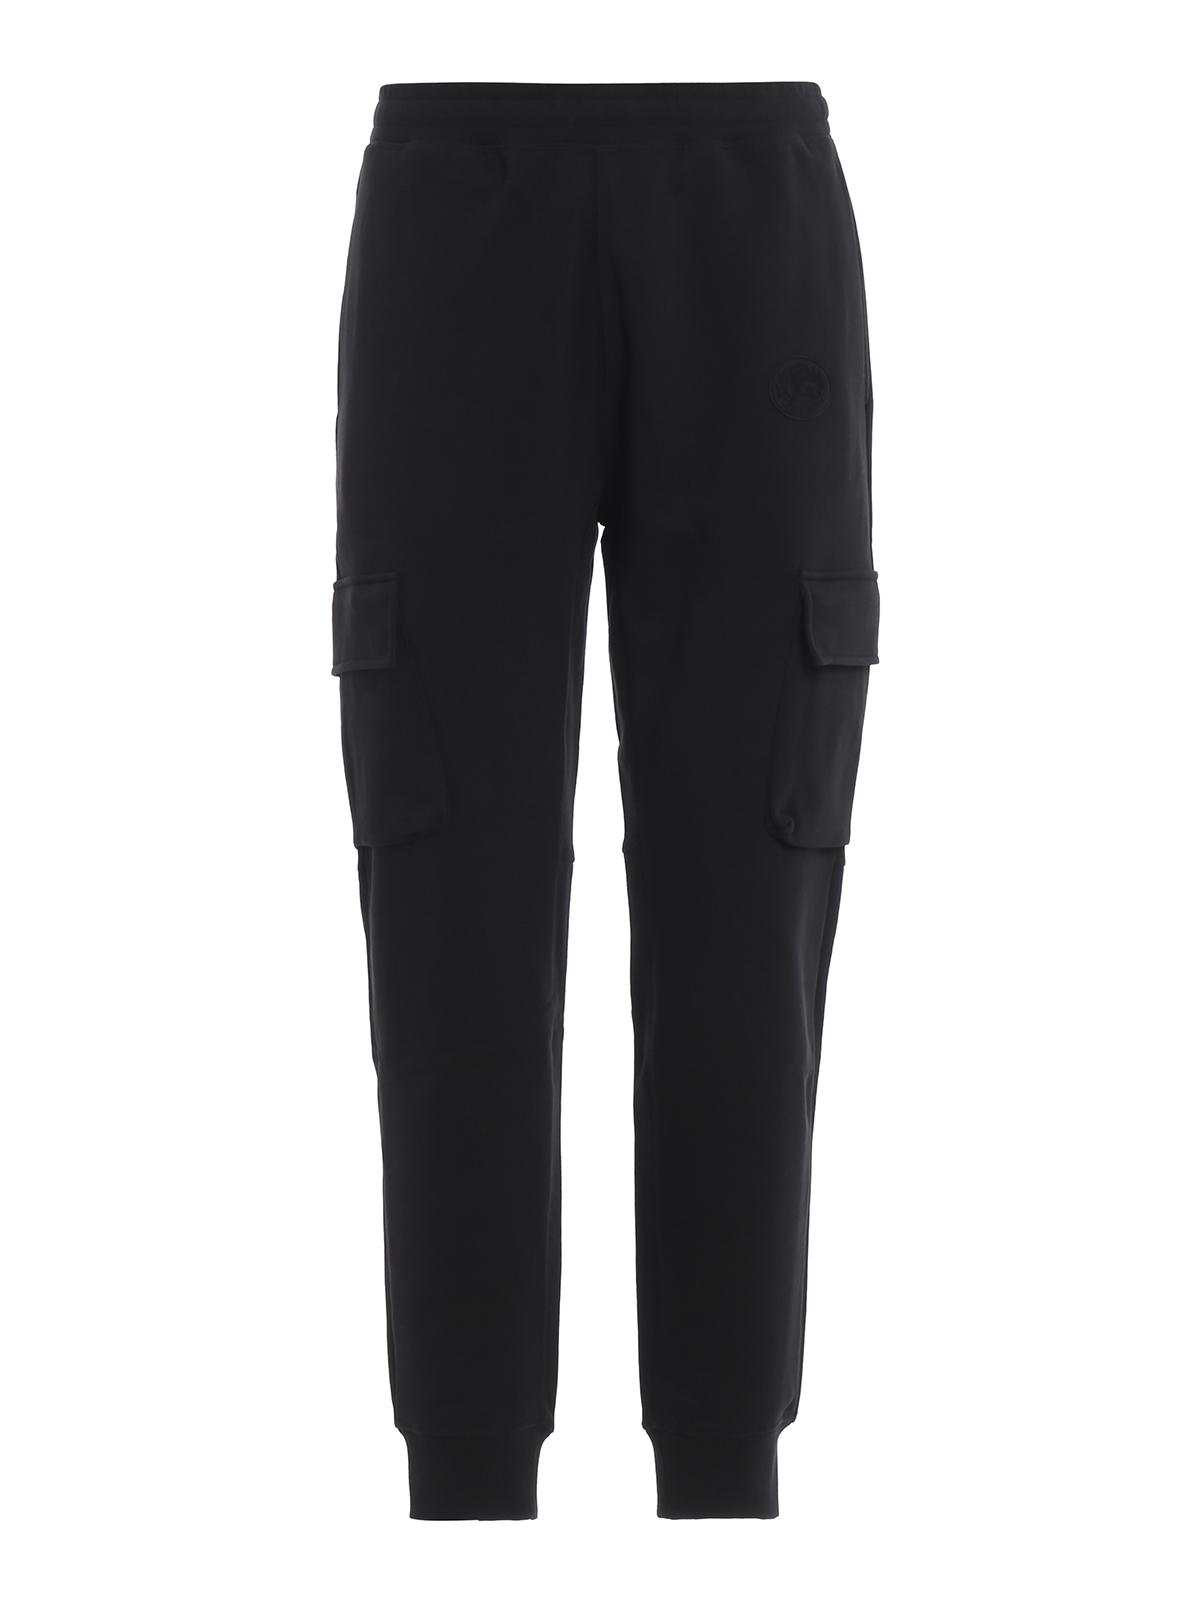 BURBERRY  tracksuit bottoms - Justley cotton fleece cargo track pants 0dc67a58aae